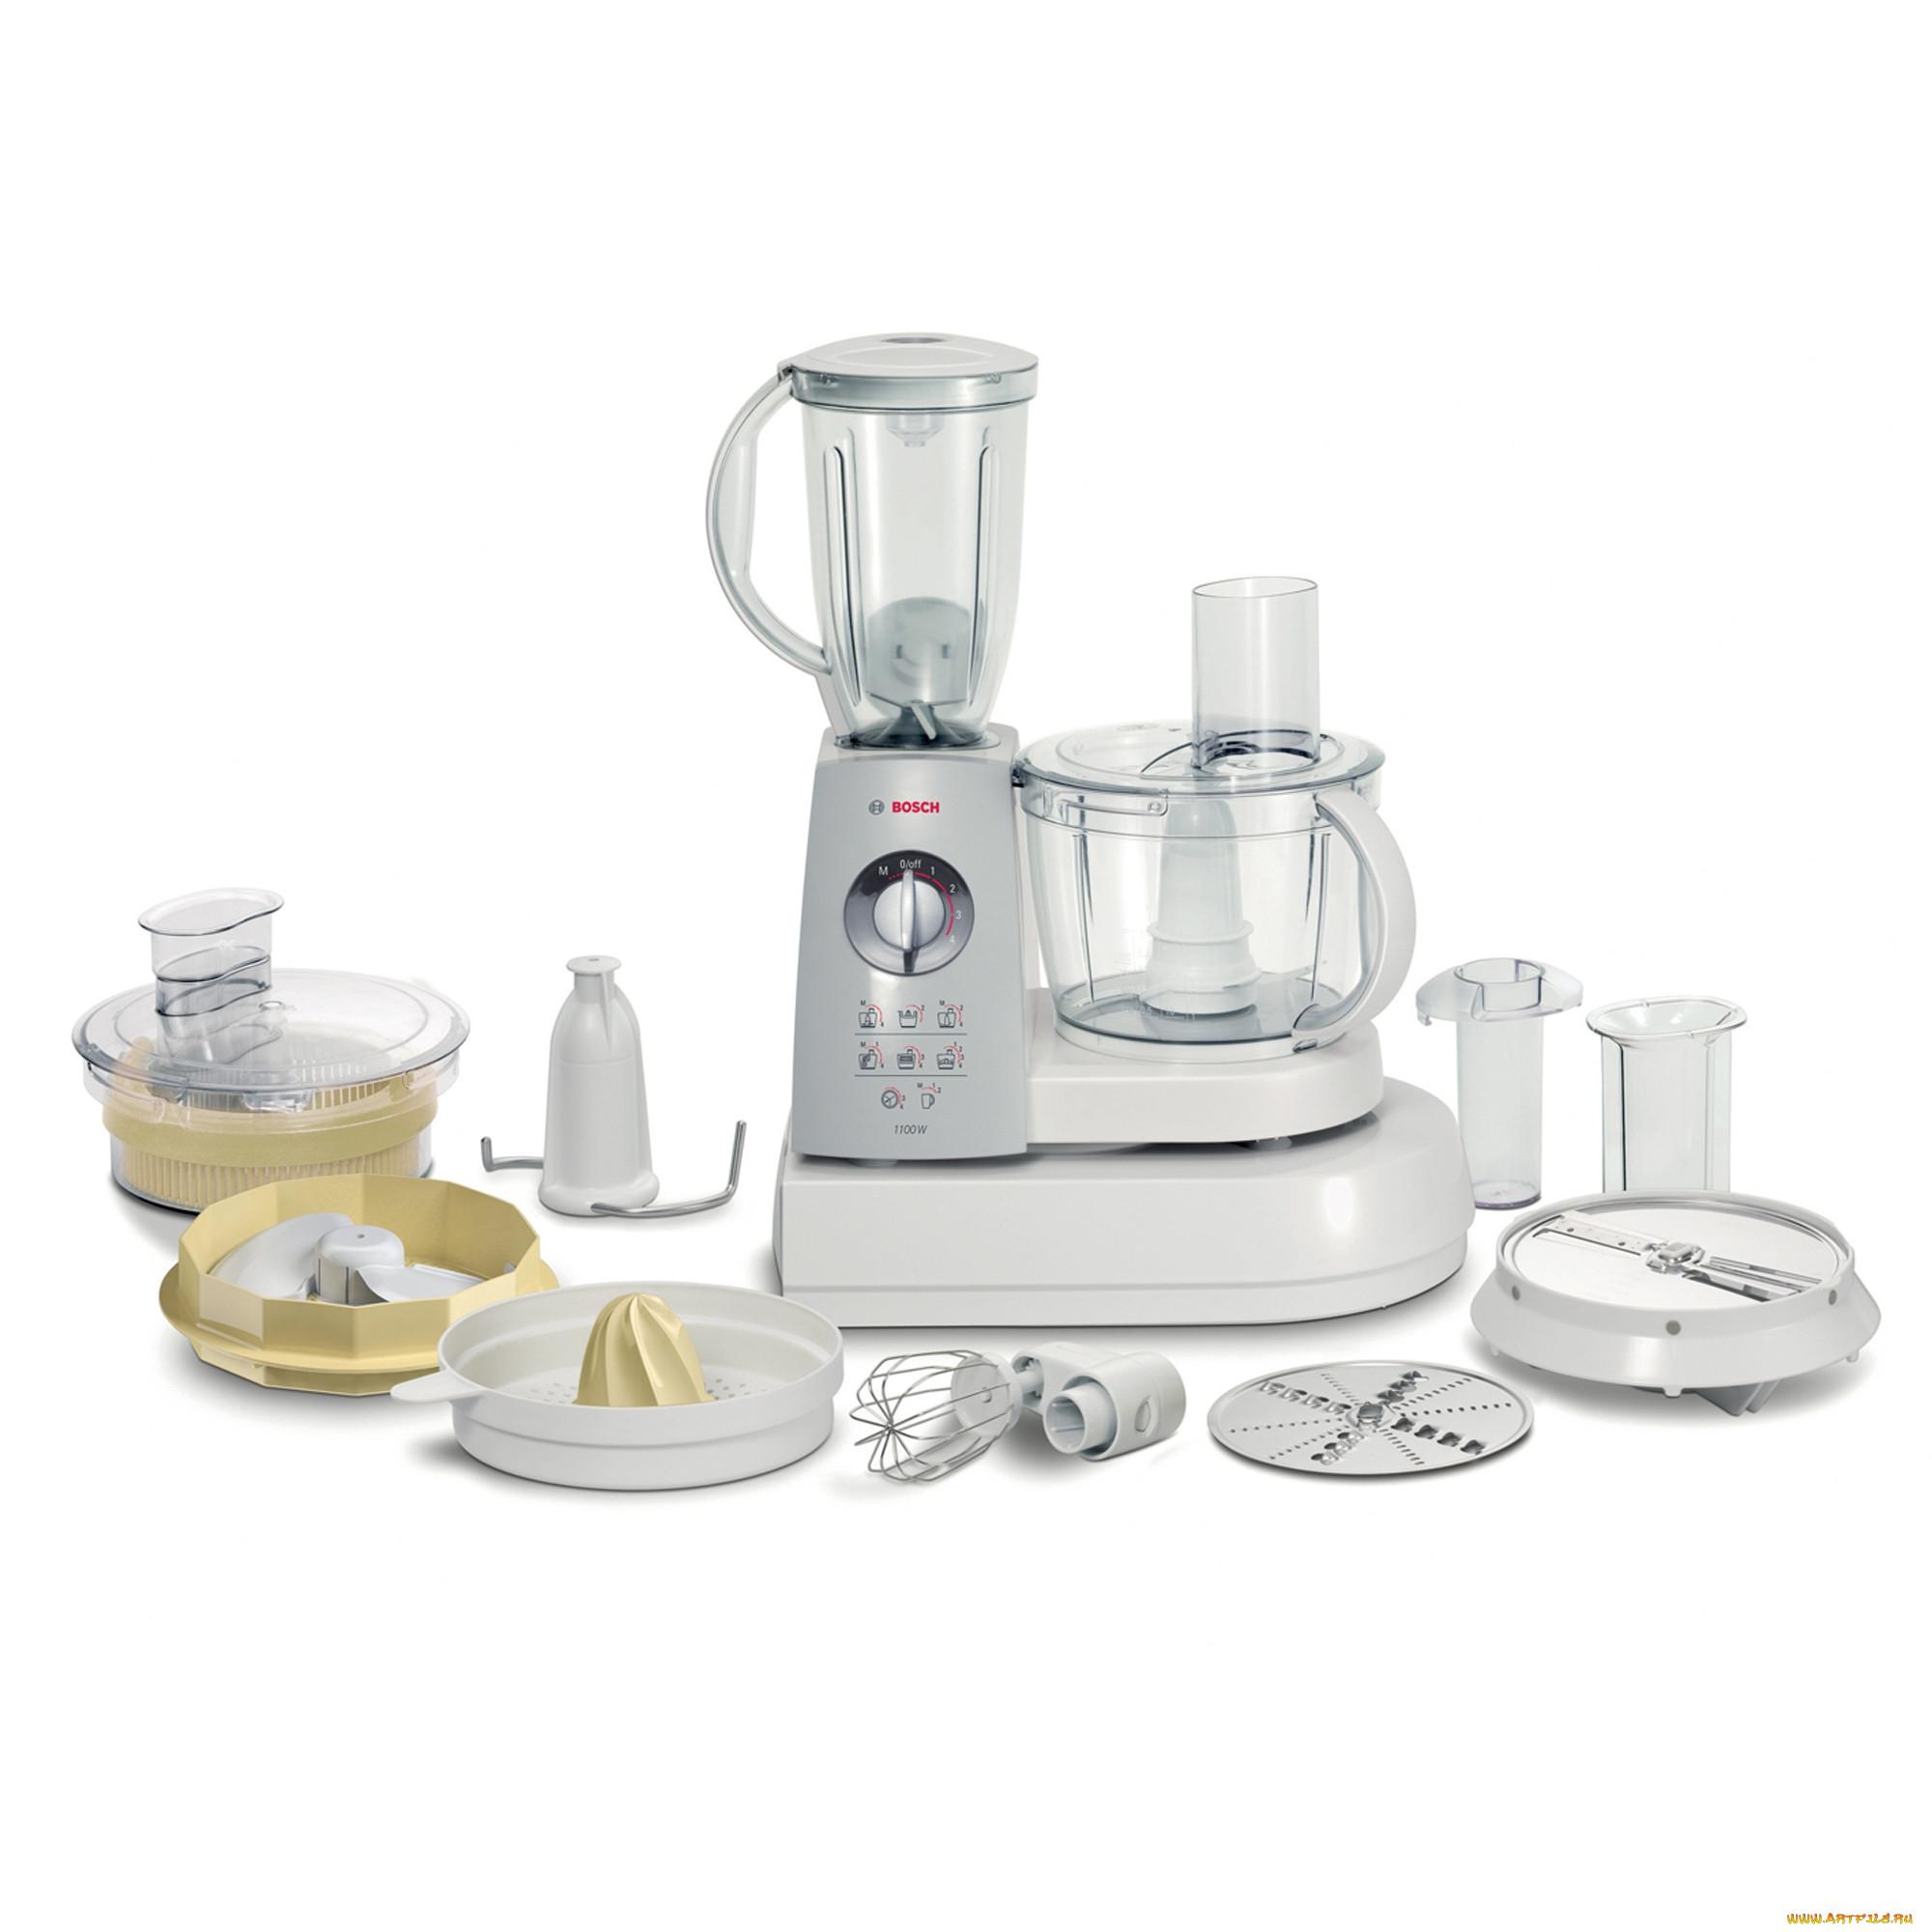 Схема кухонного комбайна bosch mcm 5529